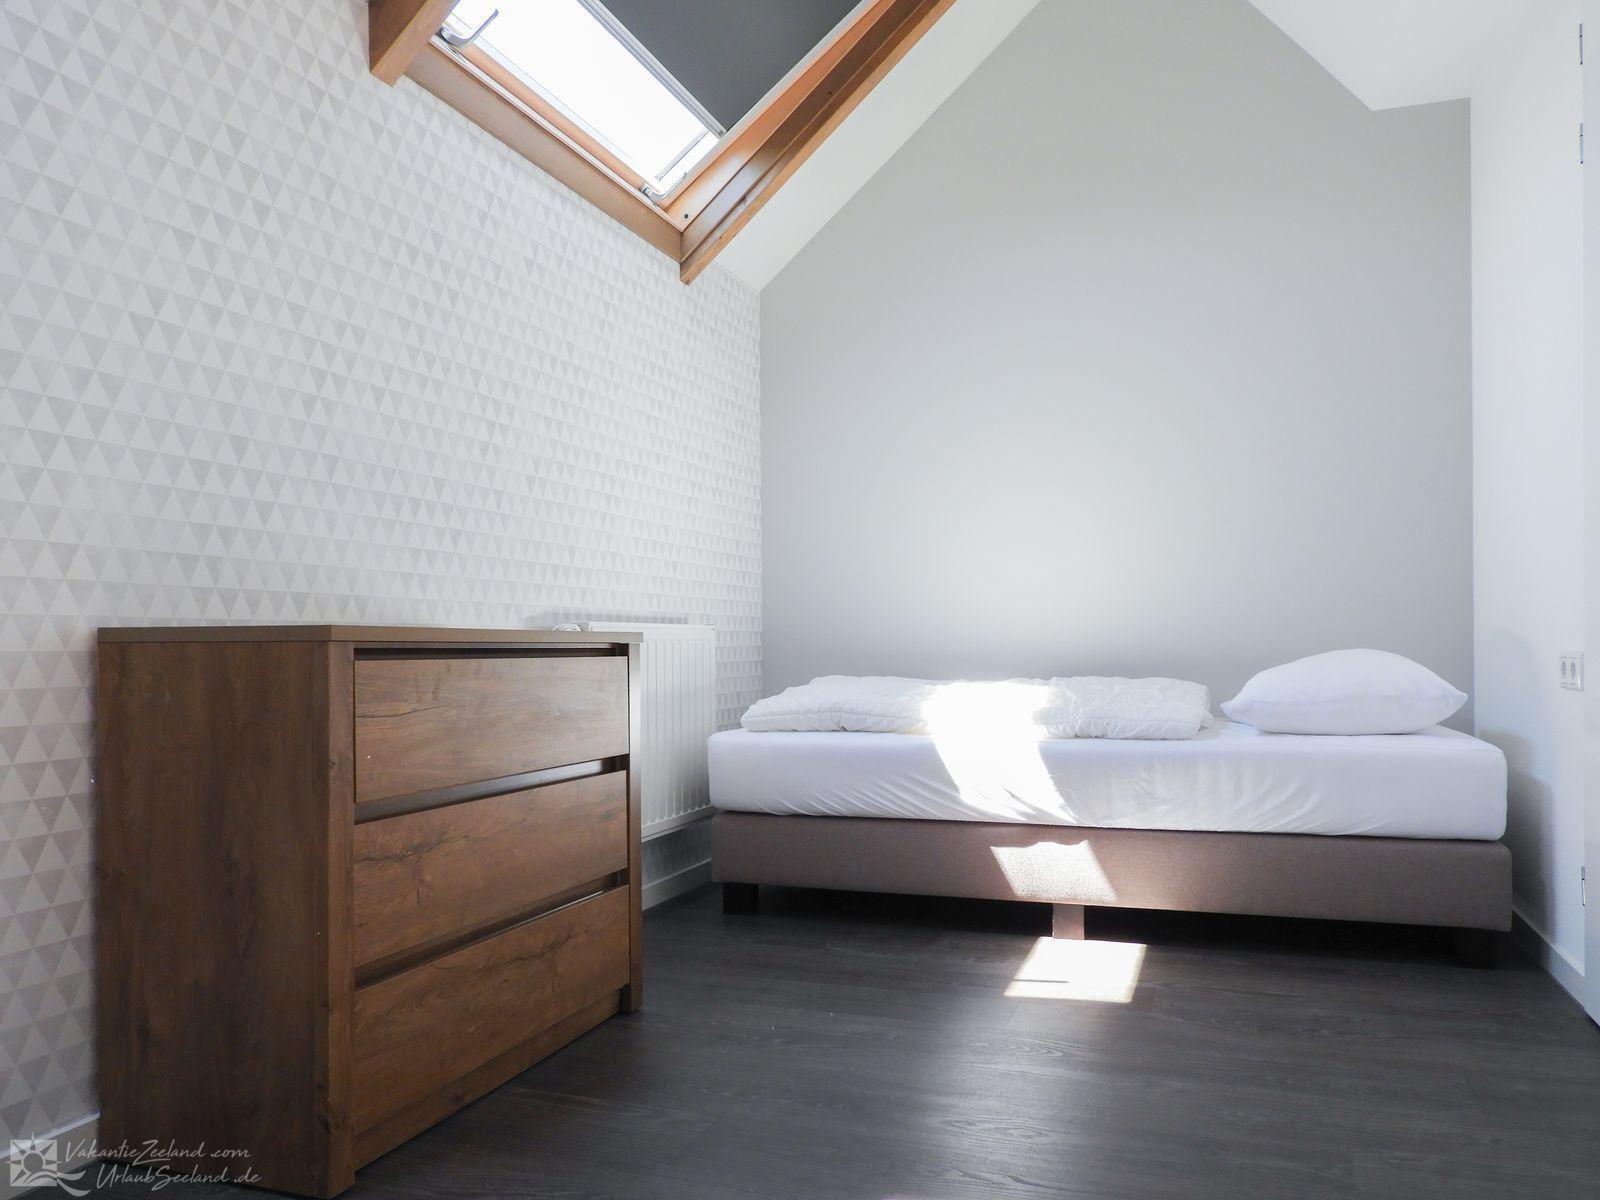 VZ587 Apartment Vrouwenpolder